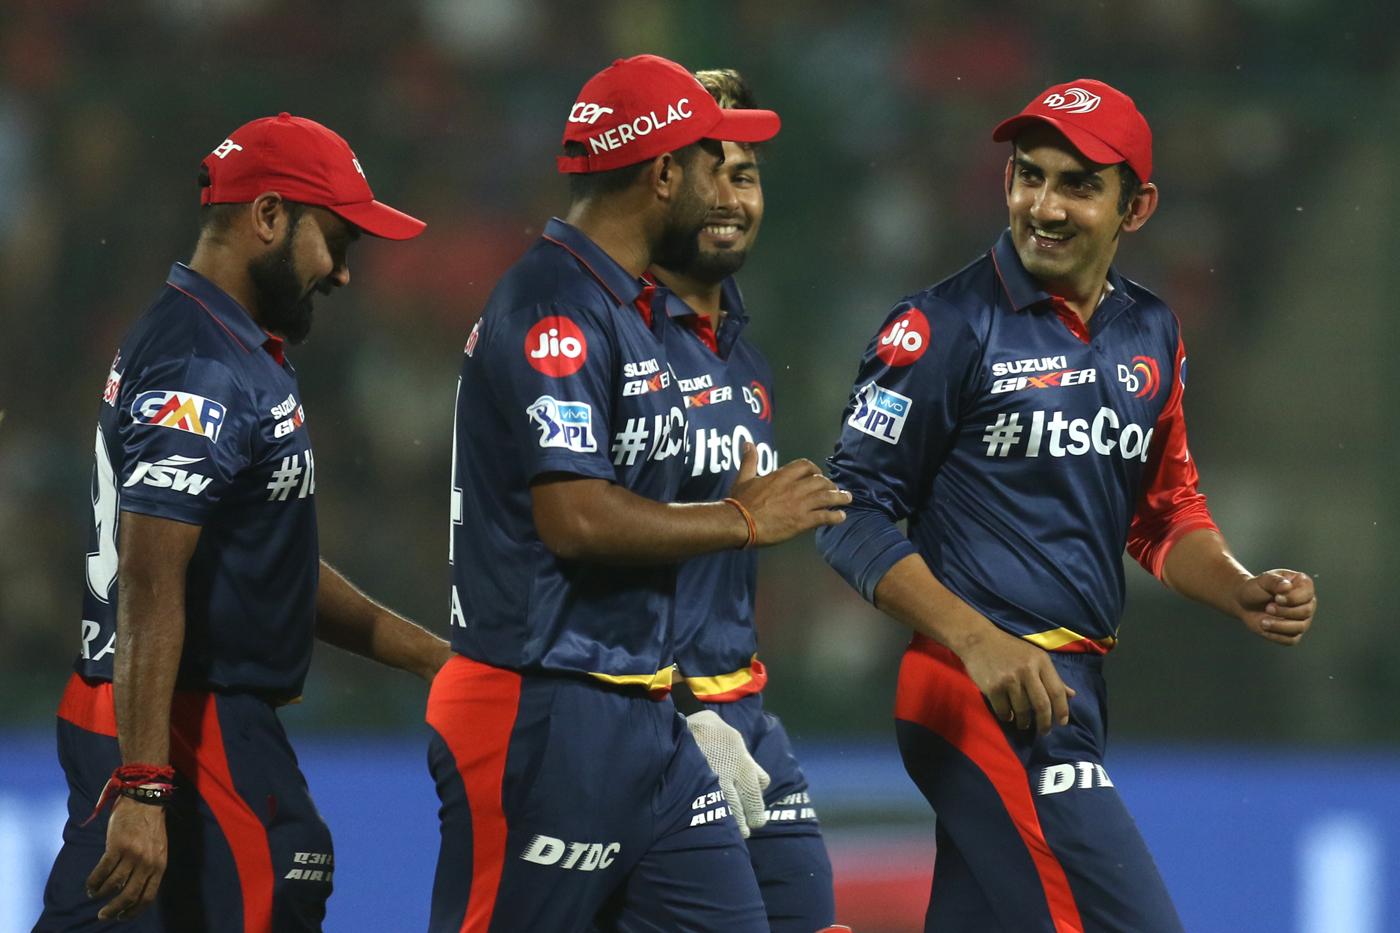 IPL 2018: Gautam Gambhir Steps Down as Delhi Daredevils' Skipper